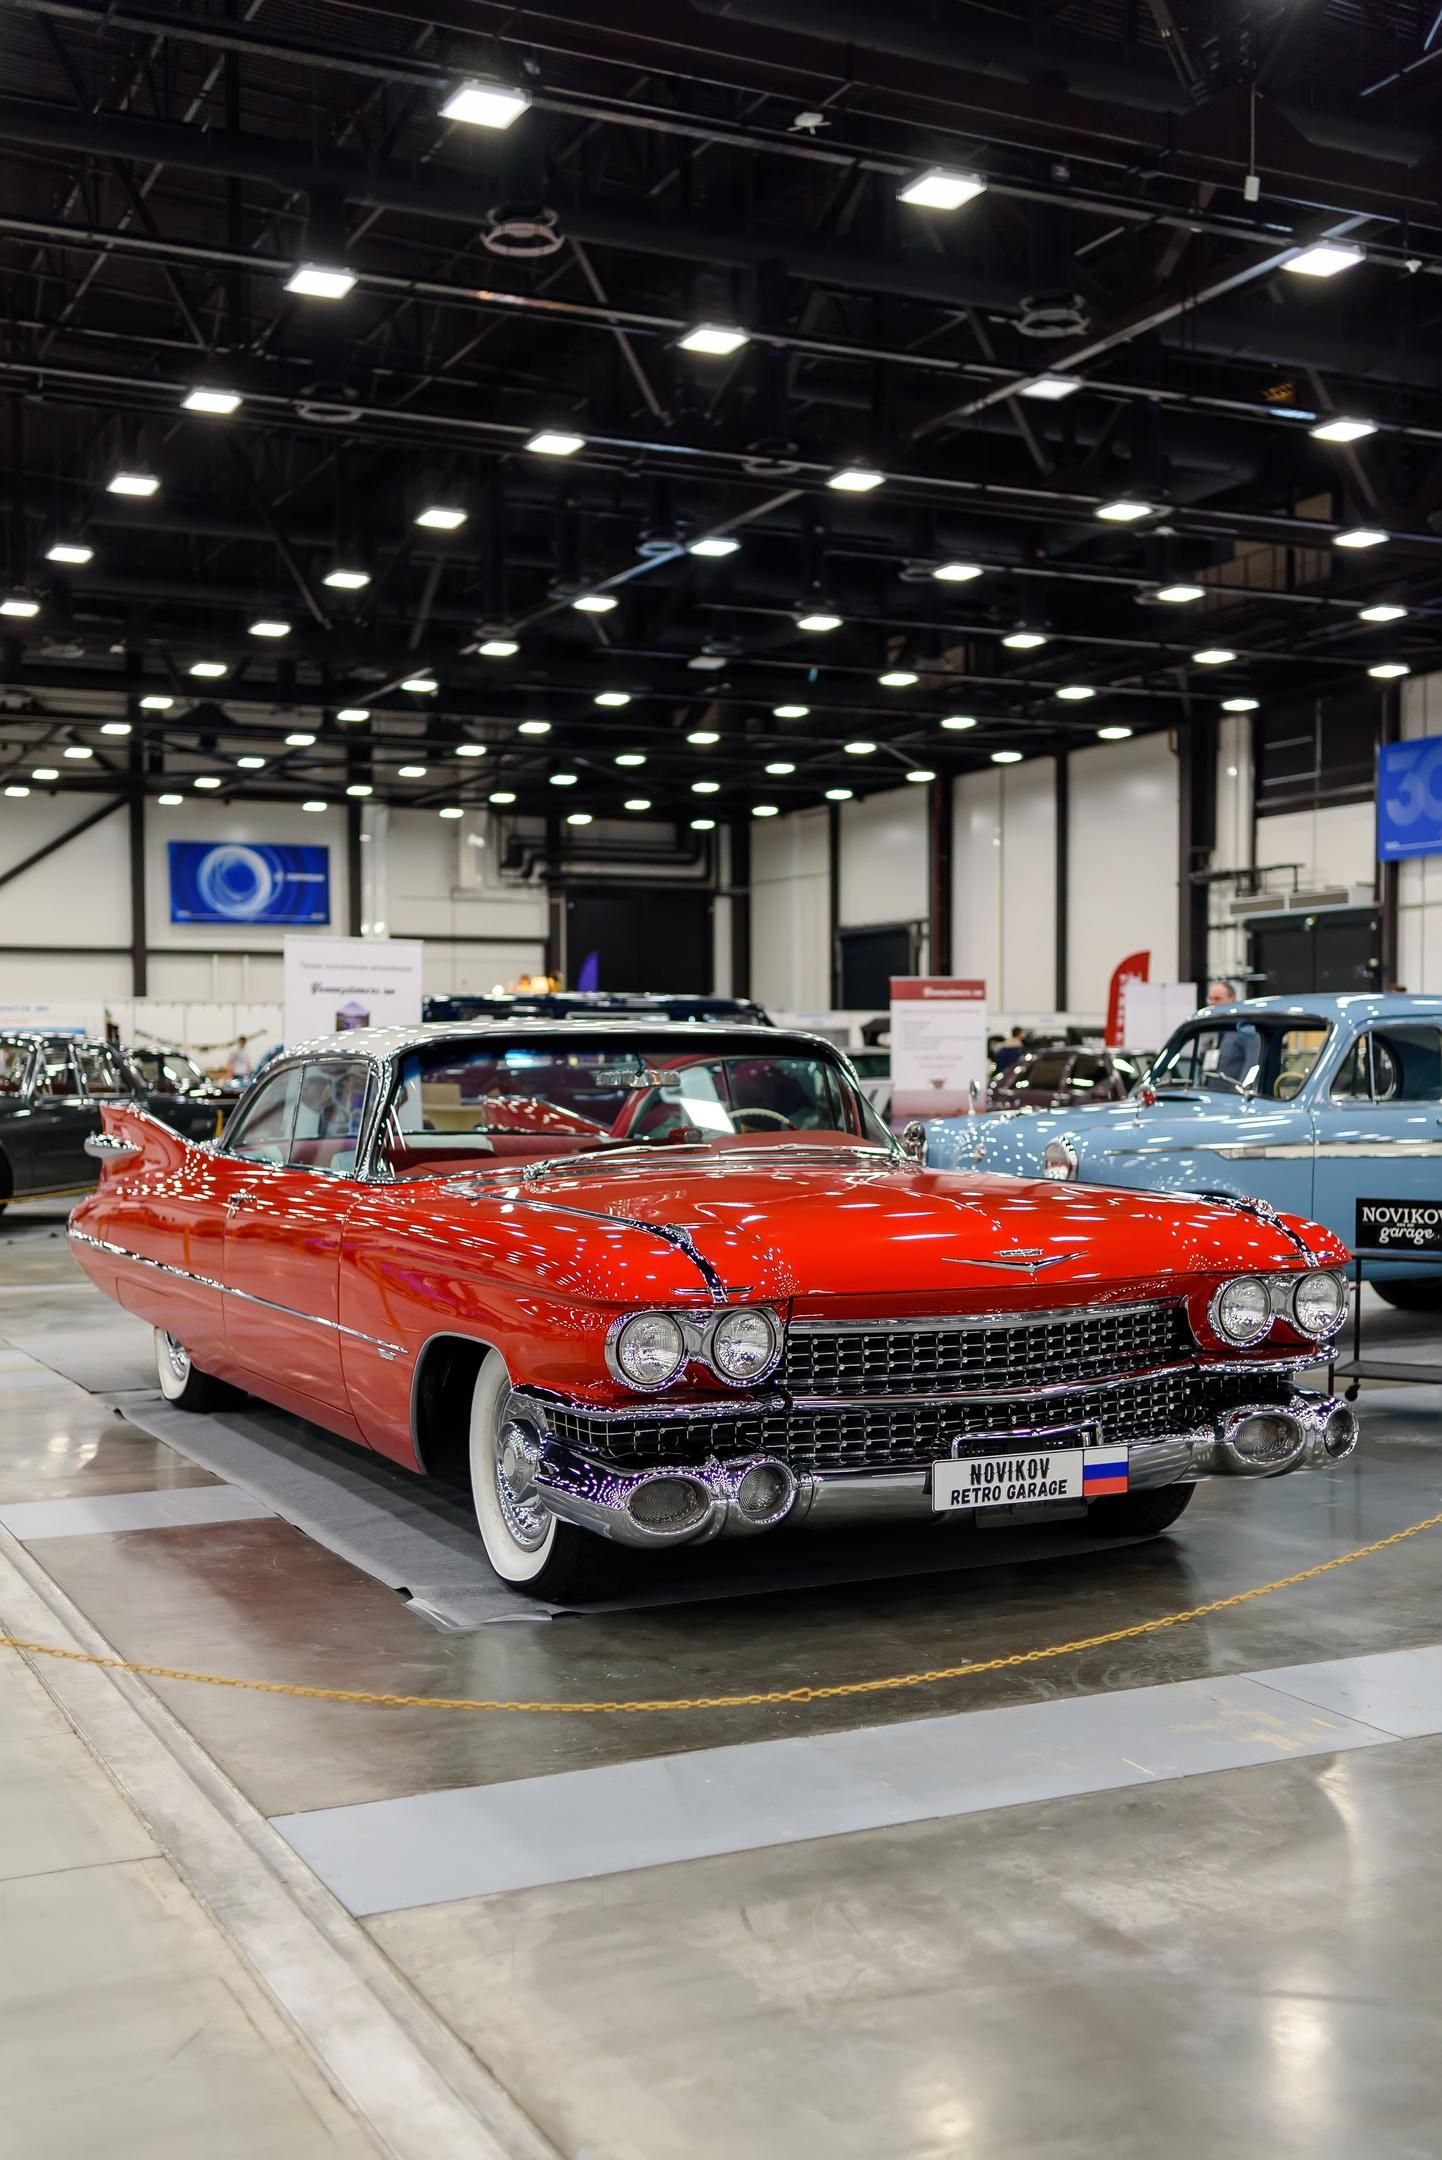 Cadillac Coupe de Ville Series 62